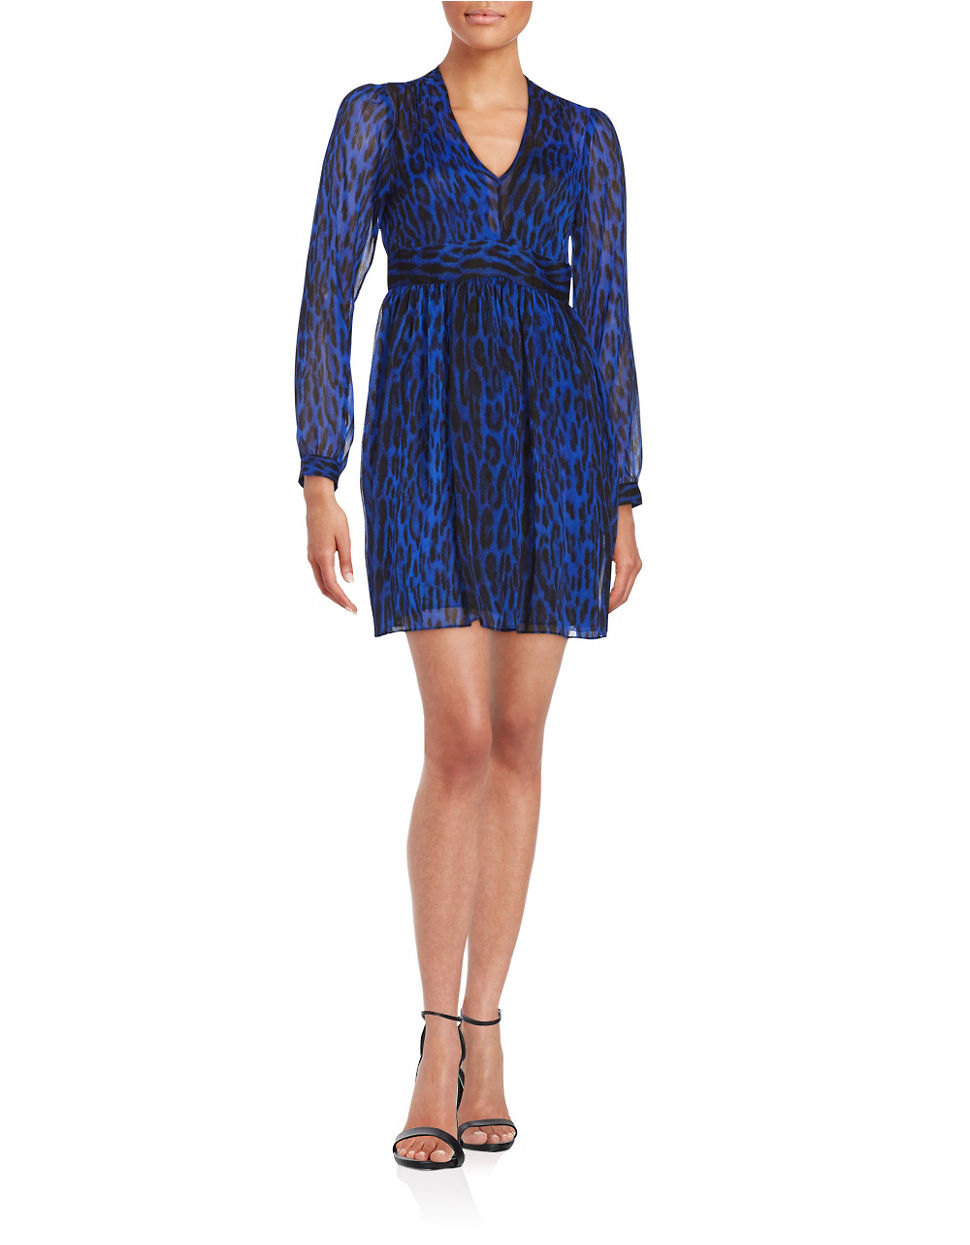 Lyst Michael Michael Kors Leopard Print V neck Dress in Blue